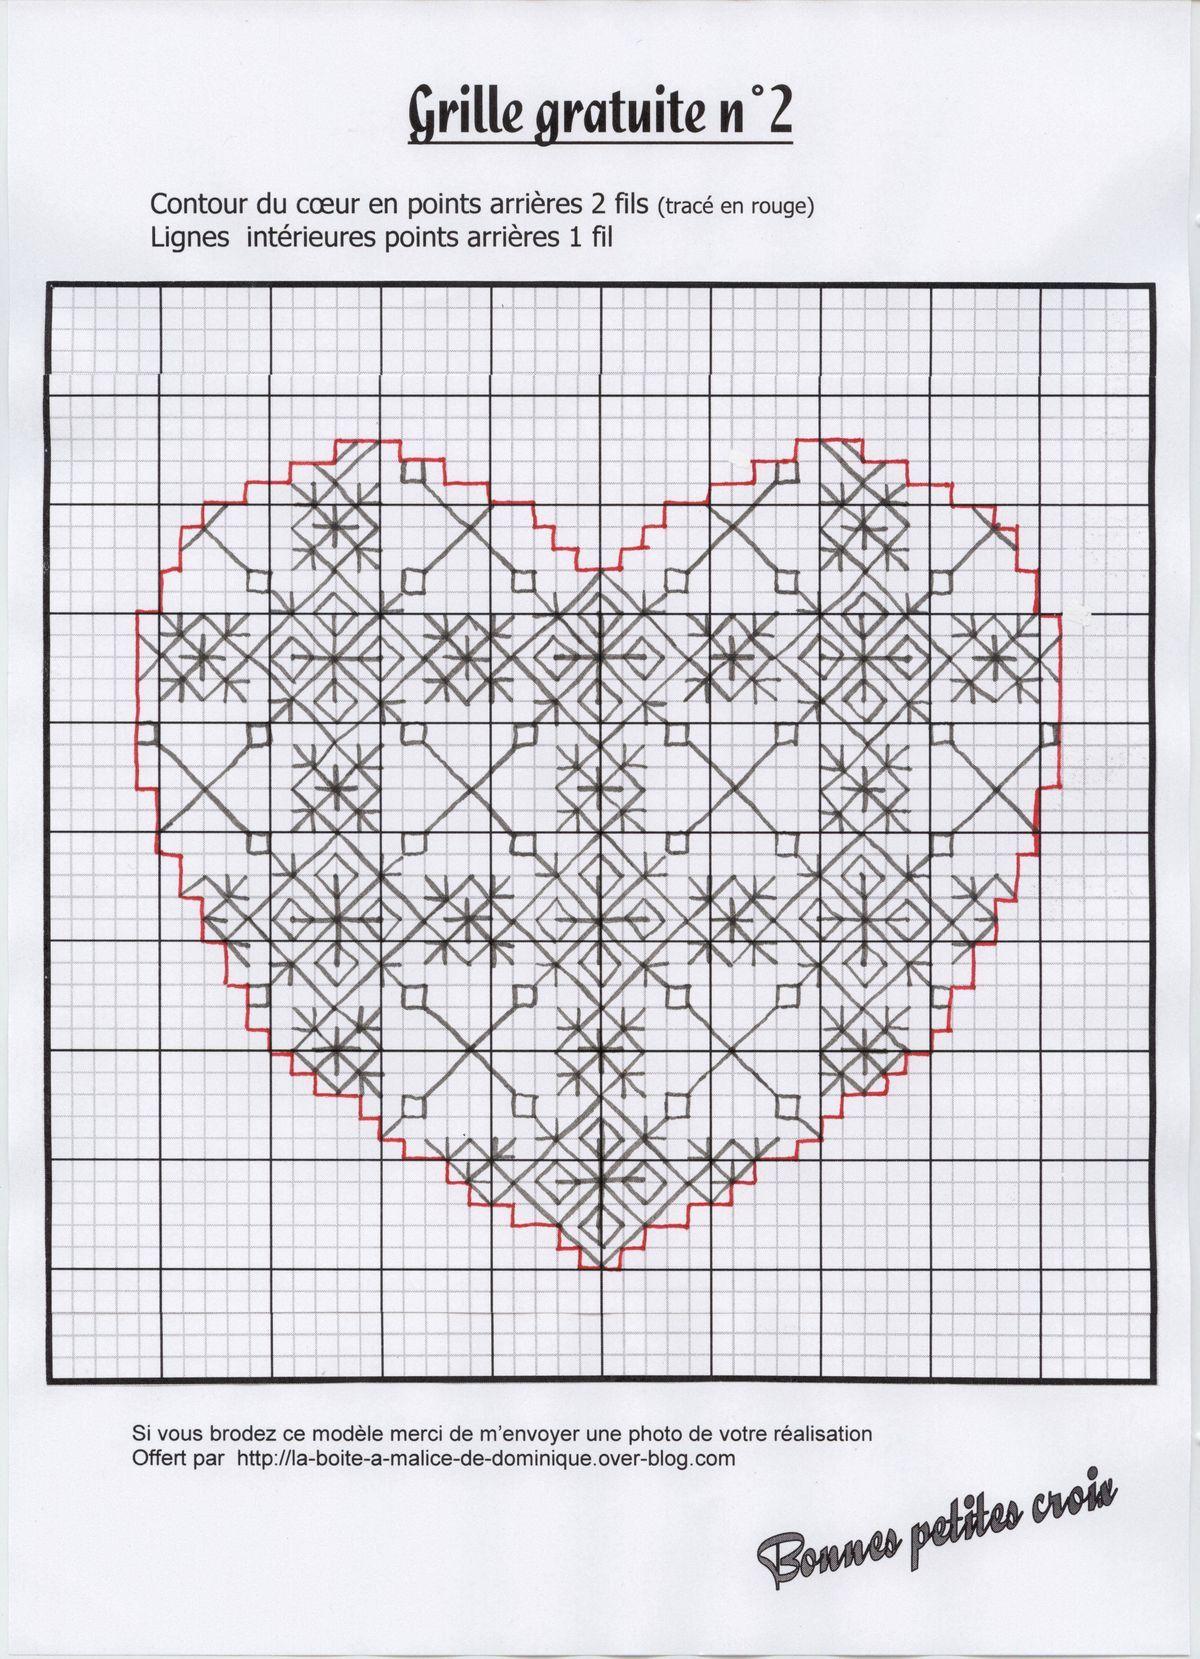 Pin by JoAnn Major on Blackwork | Pinterest | Bordado, Corazones and ...